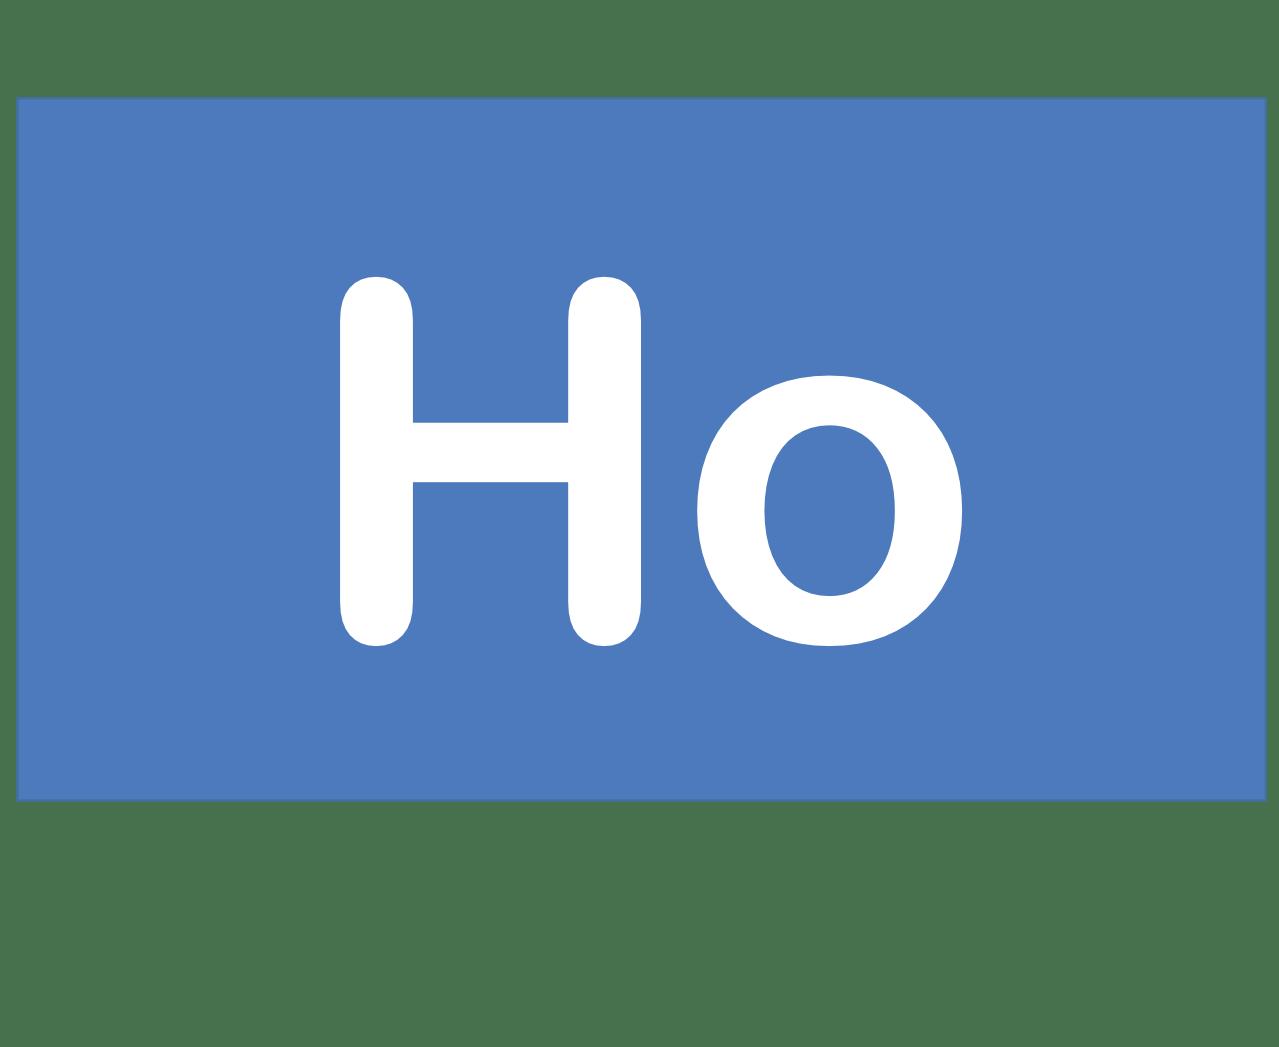 67 Ho ホルミウム Holmium 元素 記号 周期表 化学 原子